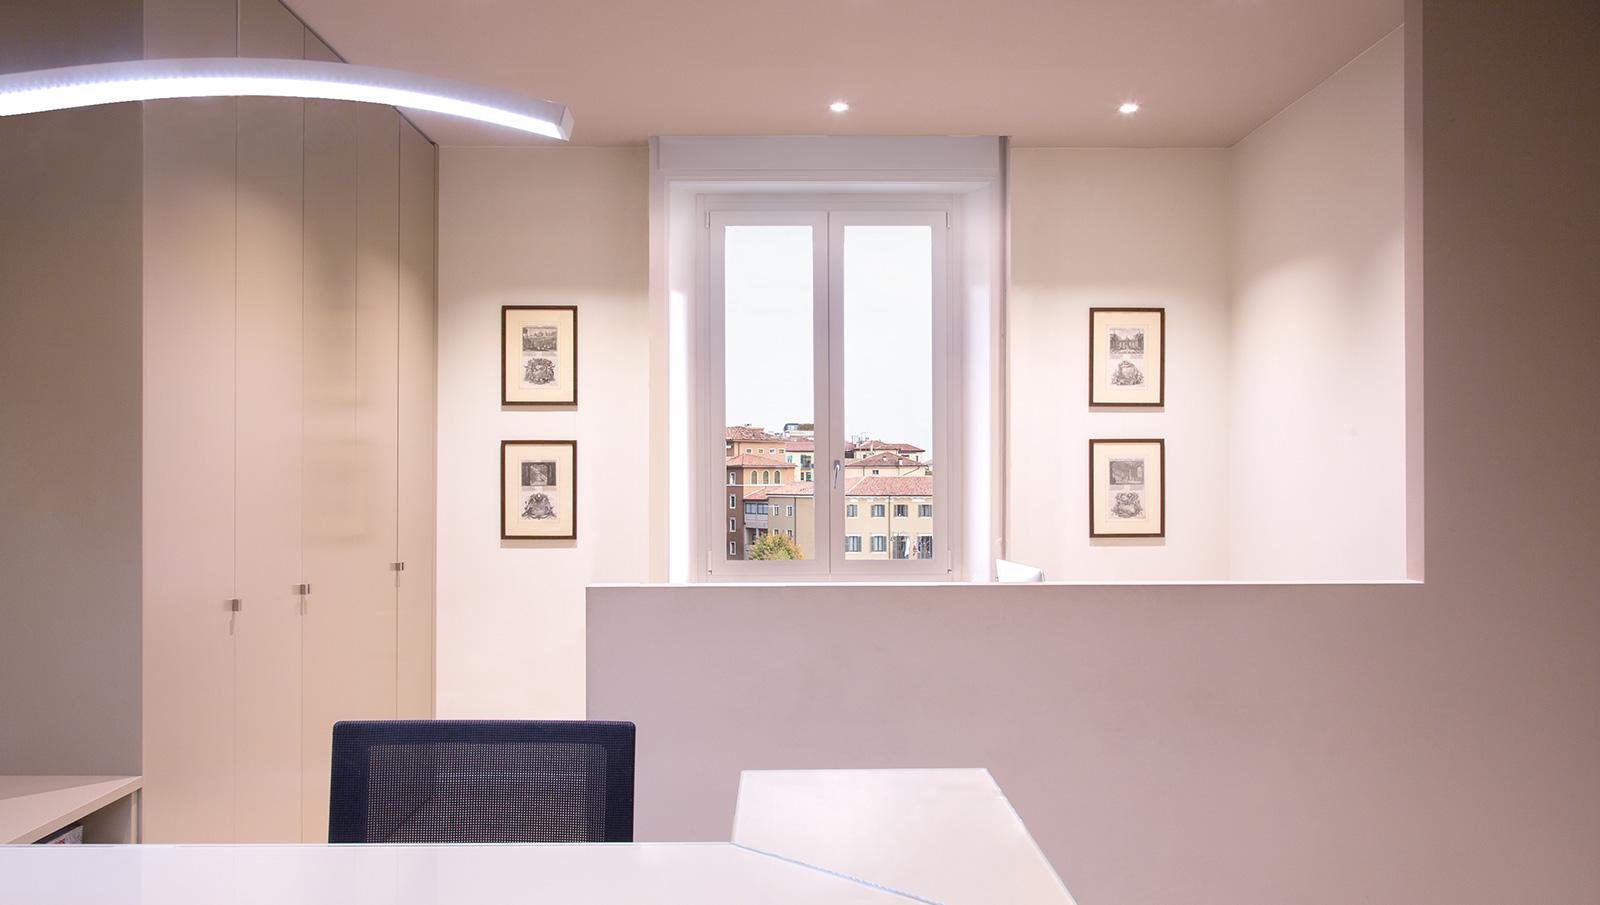 Studio legale Ascione, avvocati a Verona